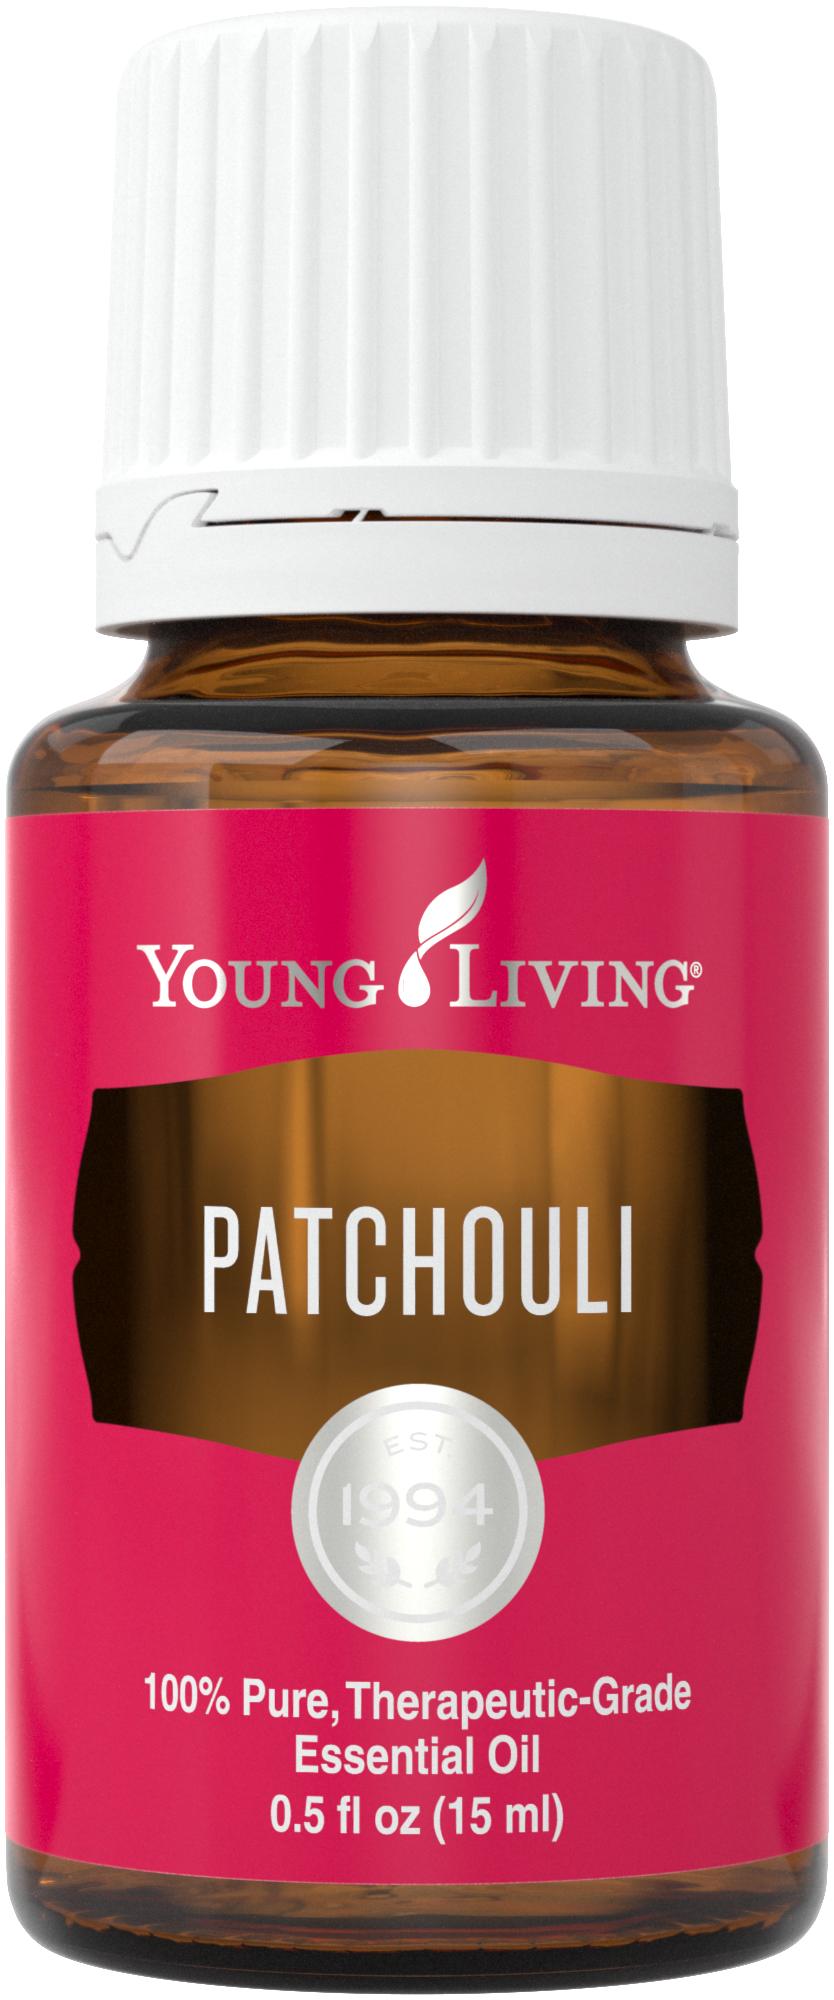 Ätherisches Öl Young Living: Patchouli 15ml